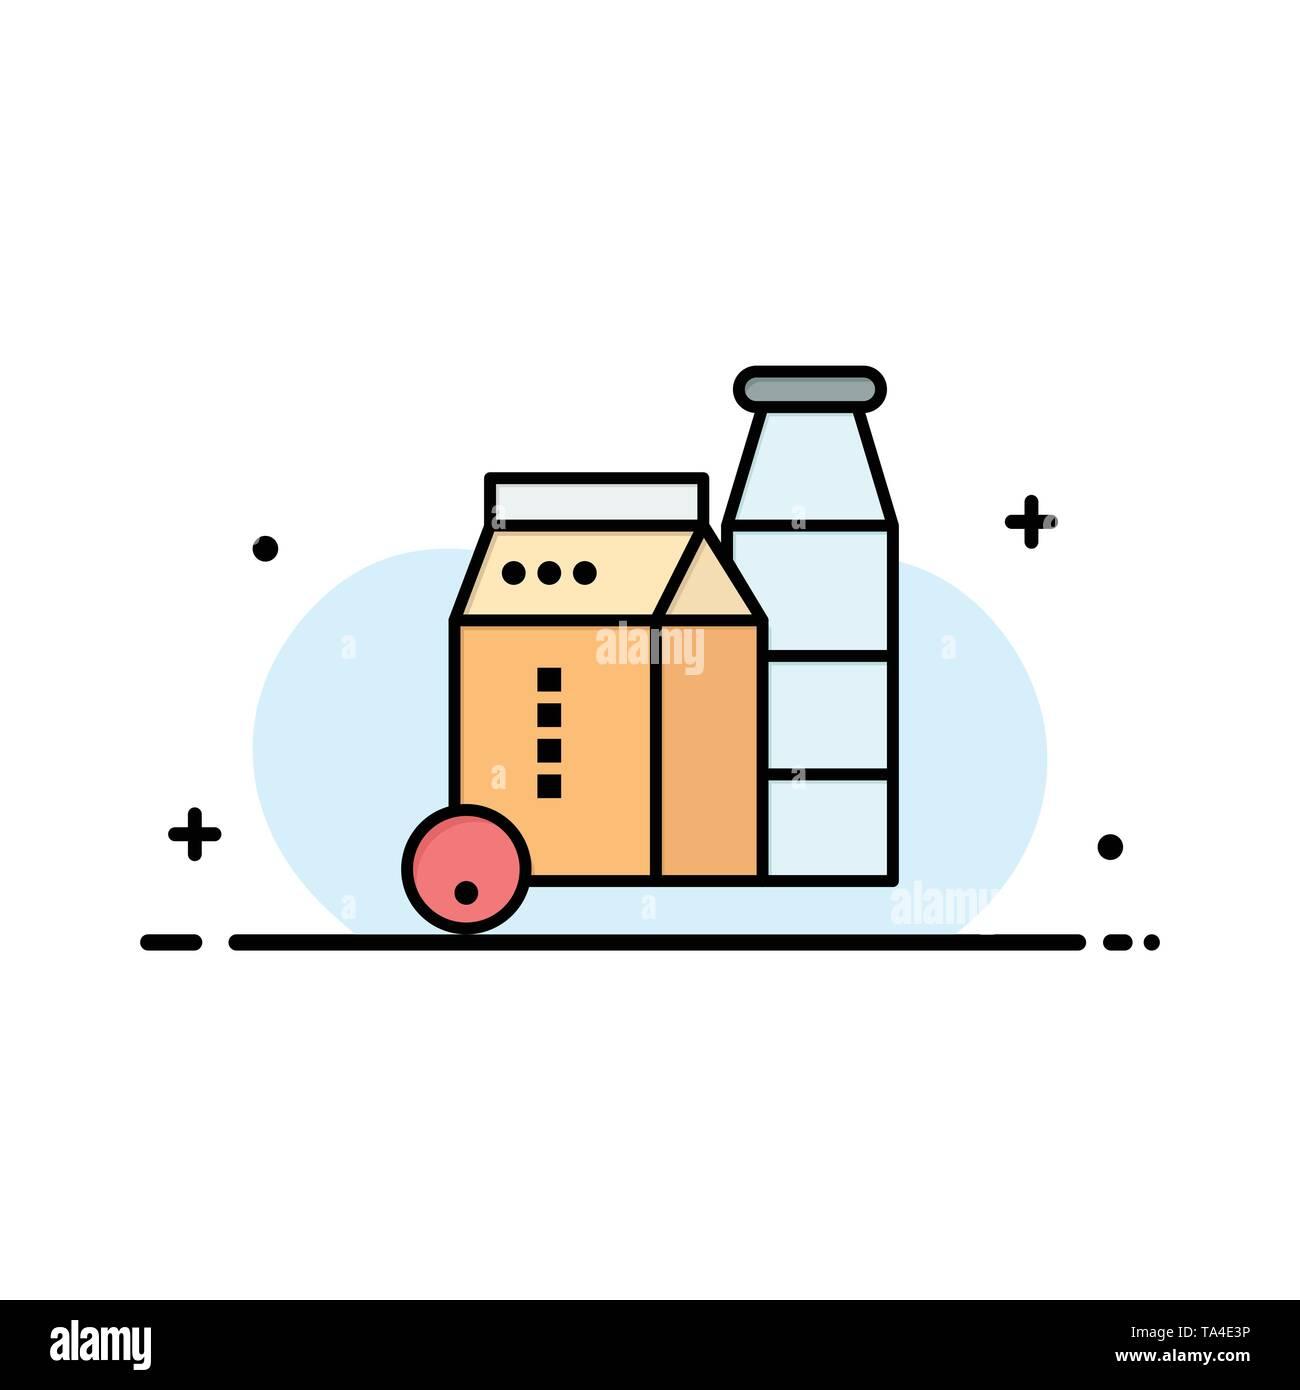 Milk, Box, Bottle, Shopping Business Logo Template. Flat Color - Stock Image